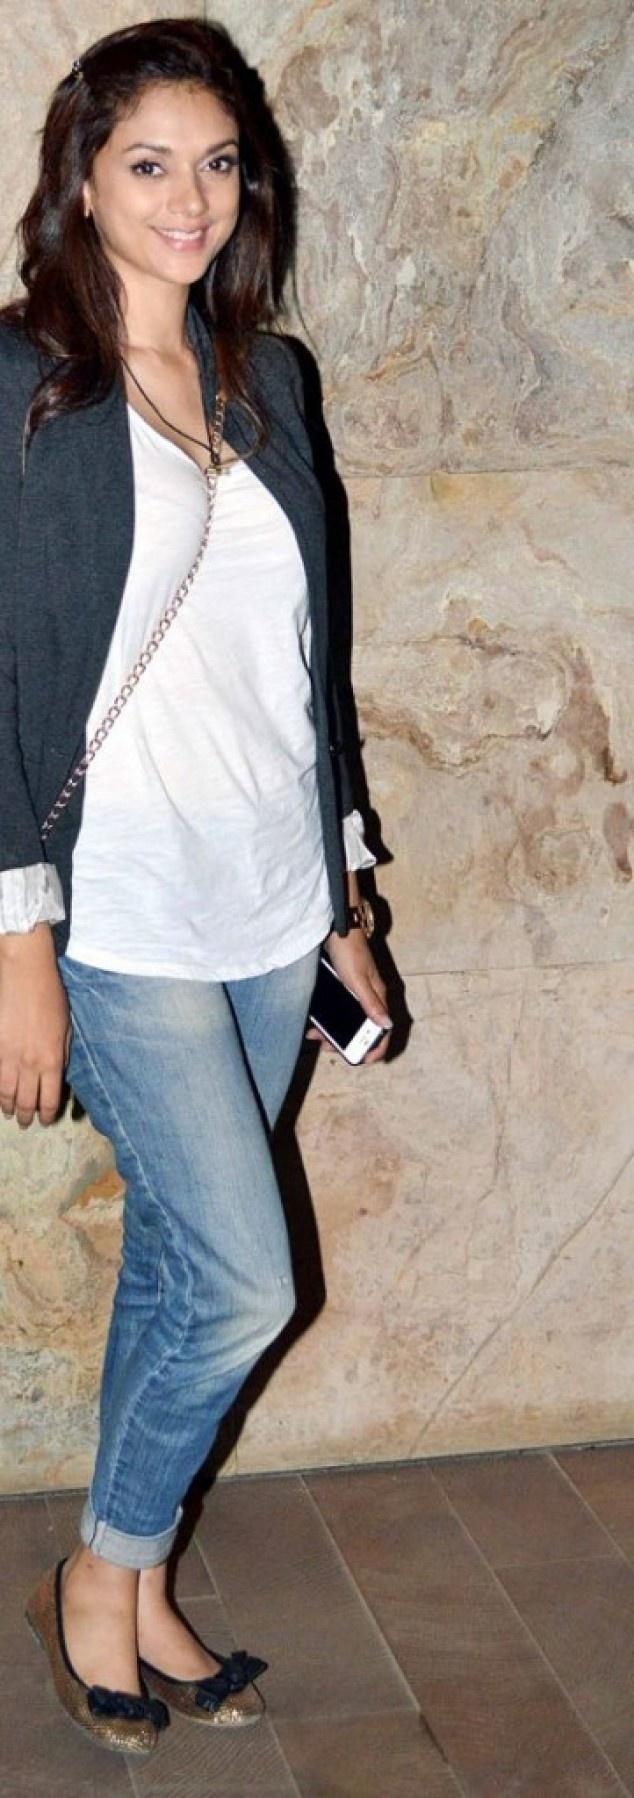 Who's Looking More Elegant? Chitrangda Singh Or Aditi Rao at Inkaar Screening | Fandiz India - Latest Indian Fashion Trends